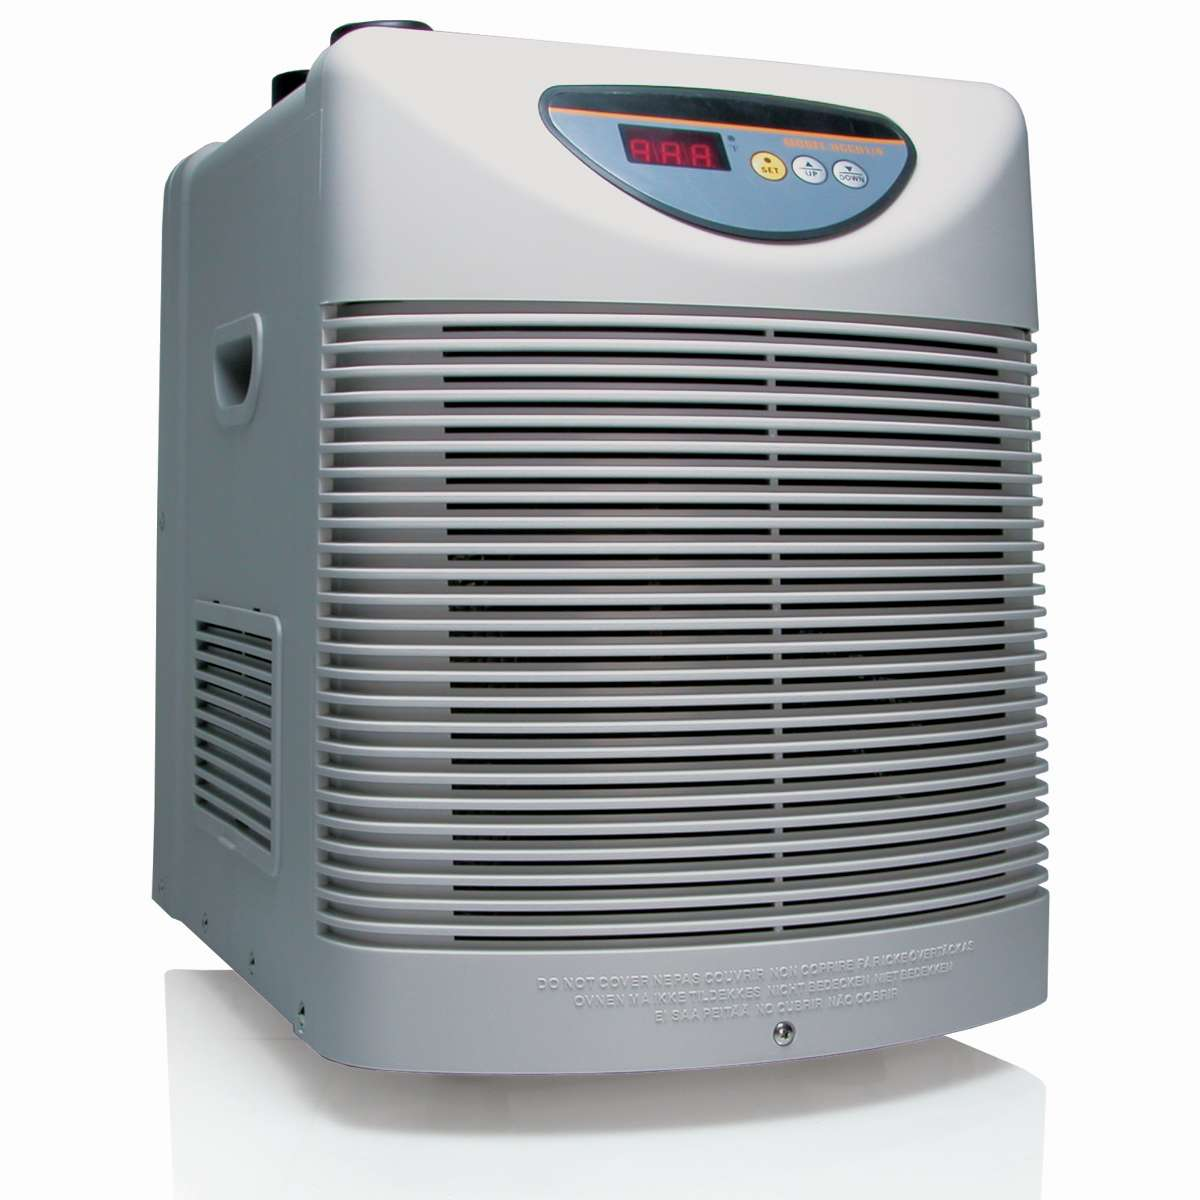 HYDROFARM AACH25 Active Aqua Chiller Refrigeration Unit 1/4 HP w/ LCD Display